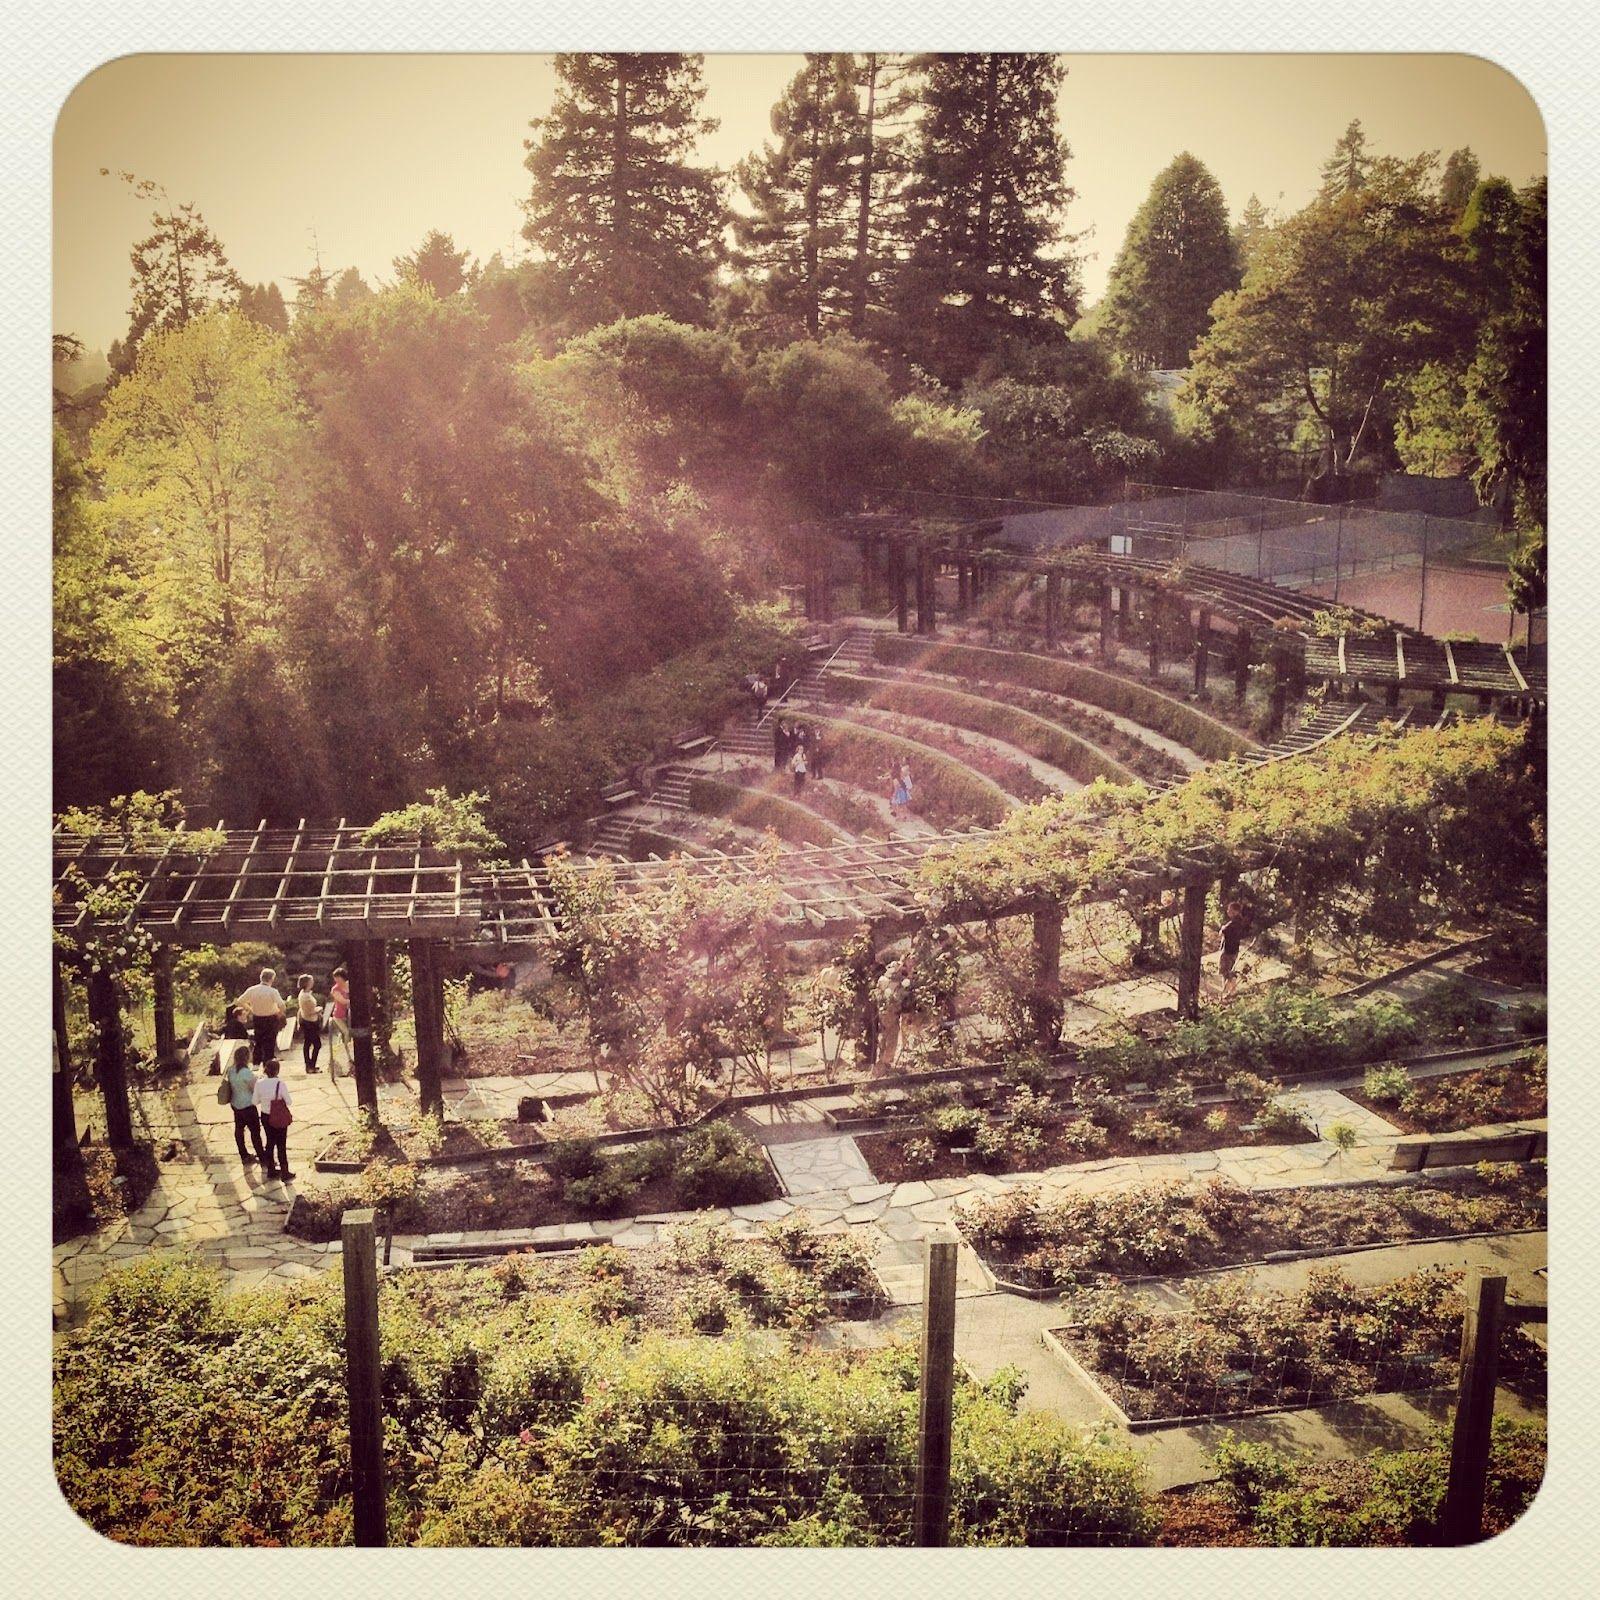 Berkeley - Rose Garden | ideas with Jo | Pinterest | Park